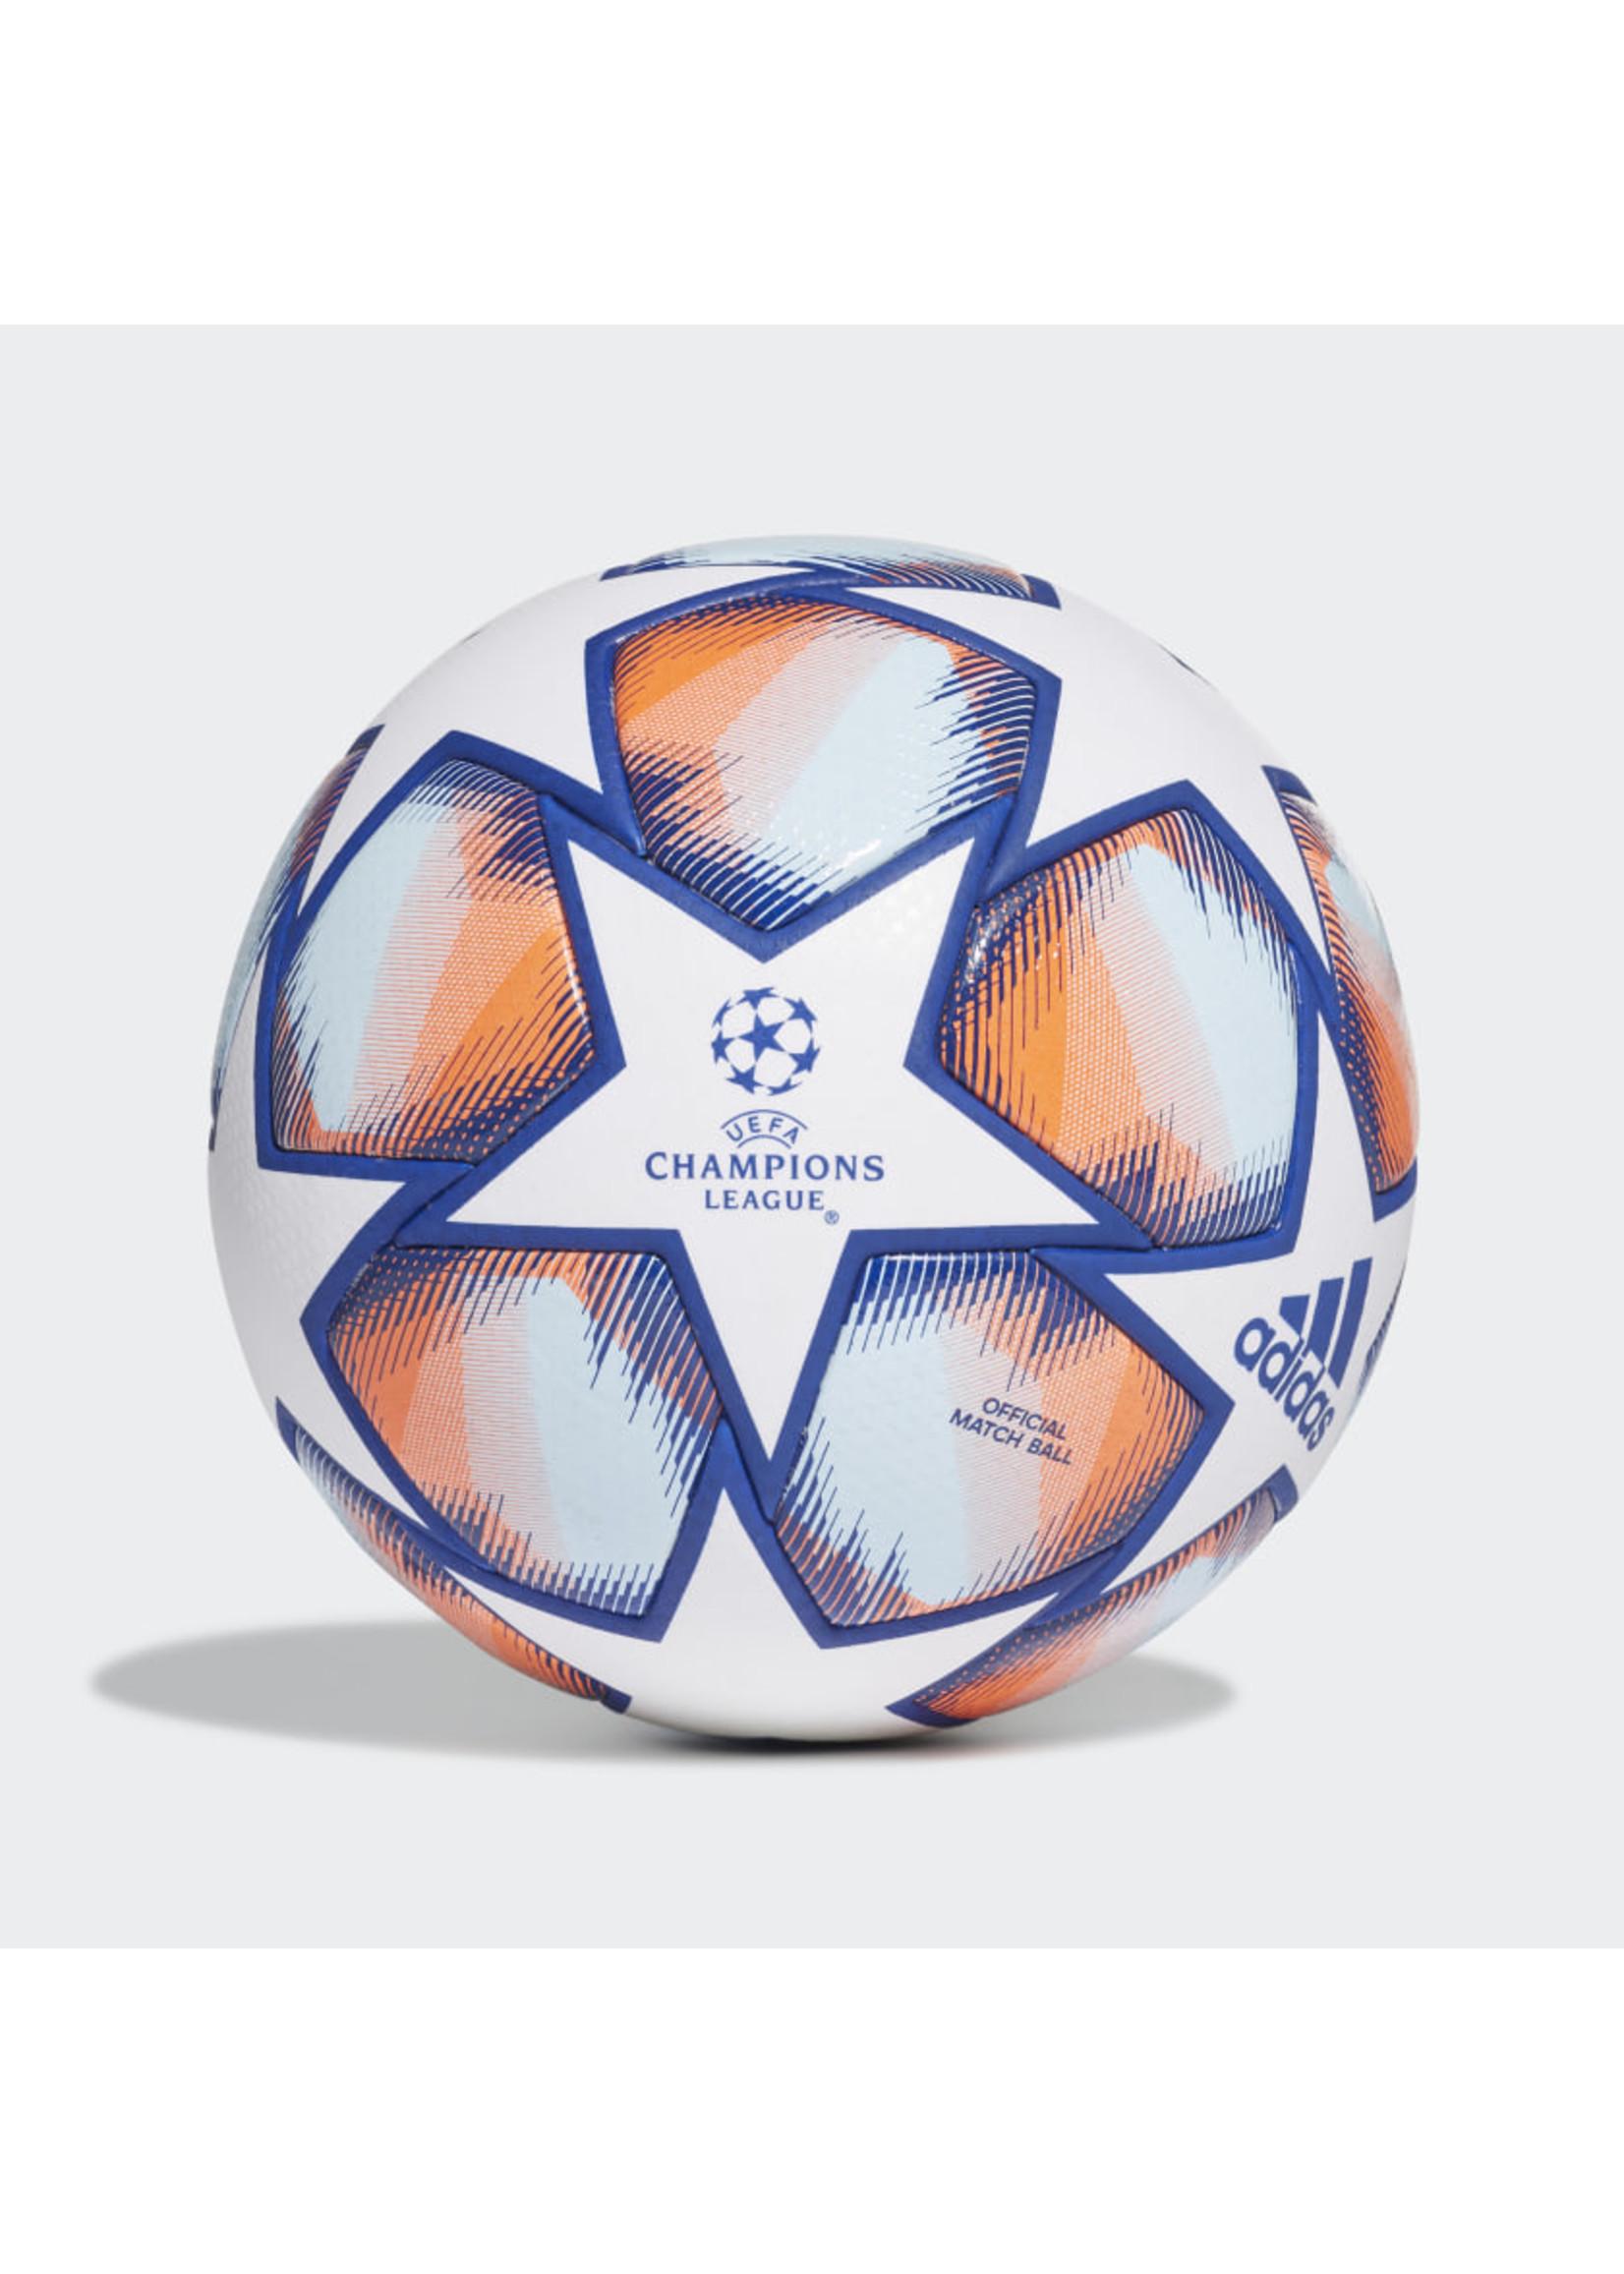 Adidas Champions League Official Match Ball